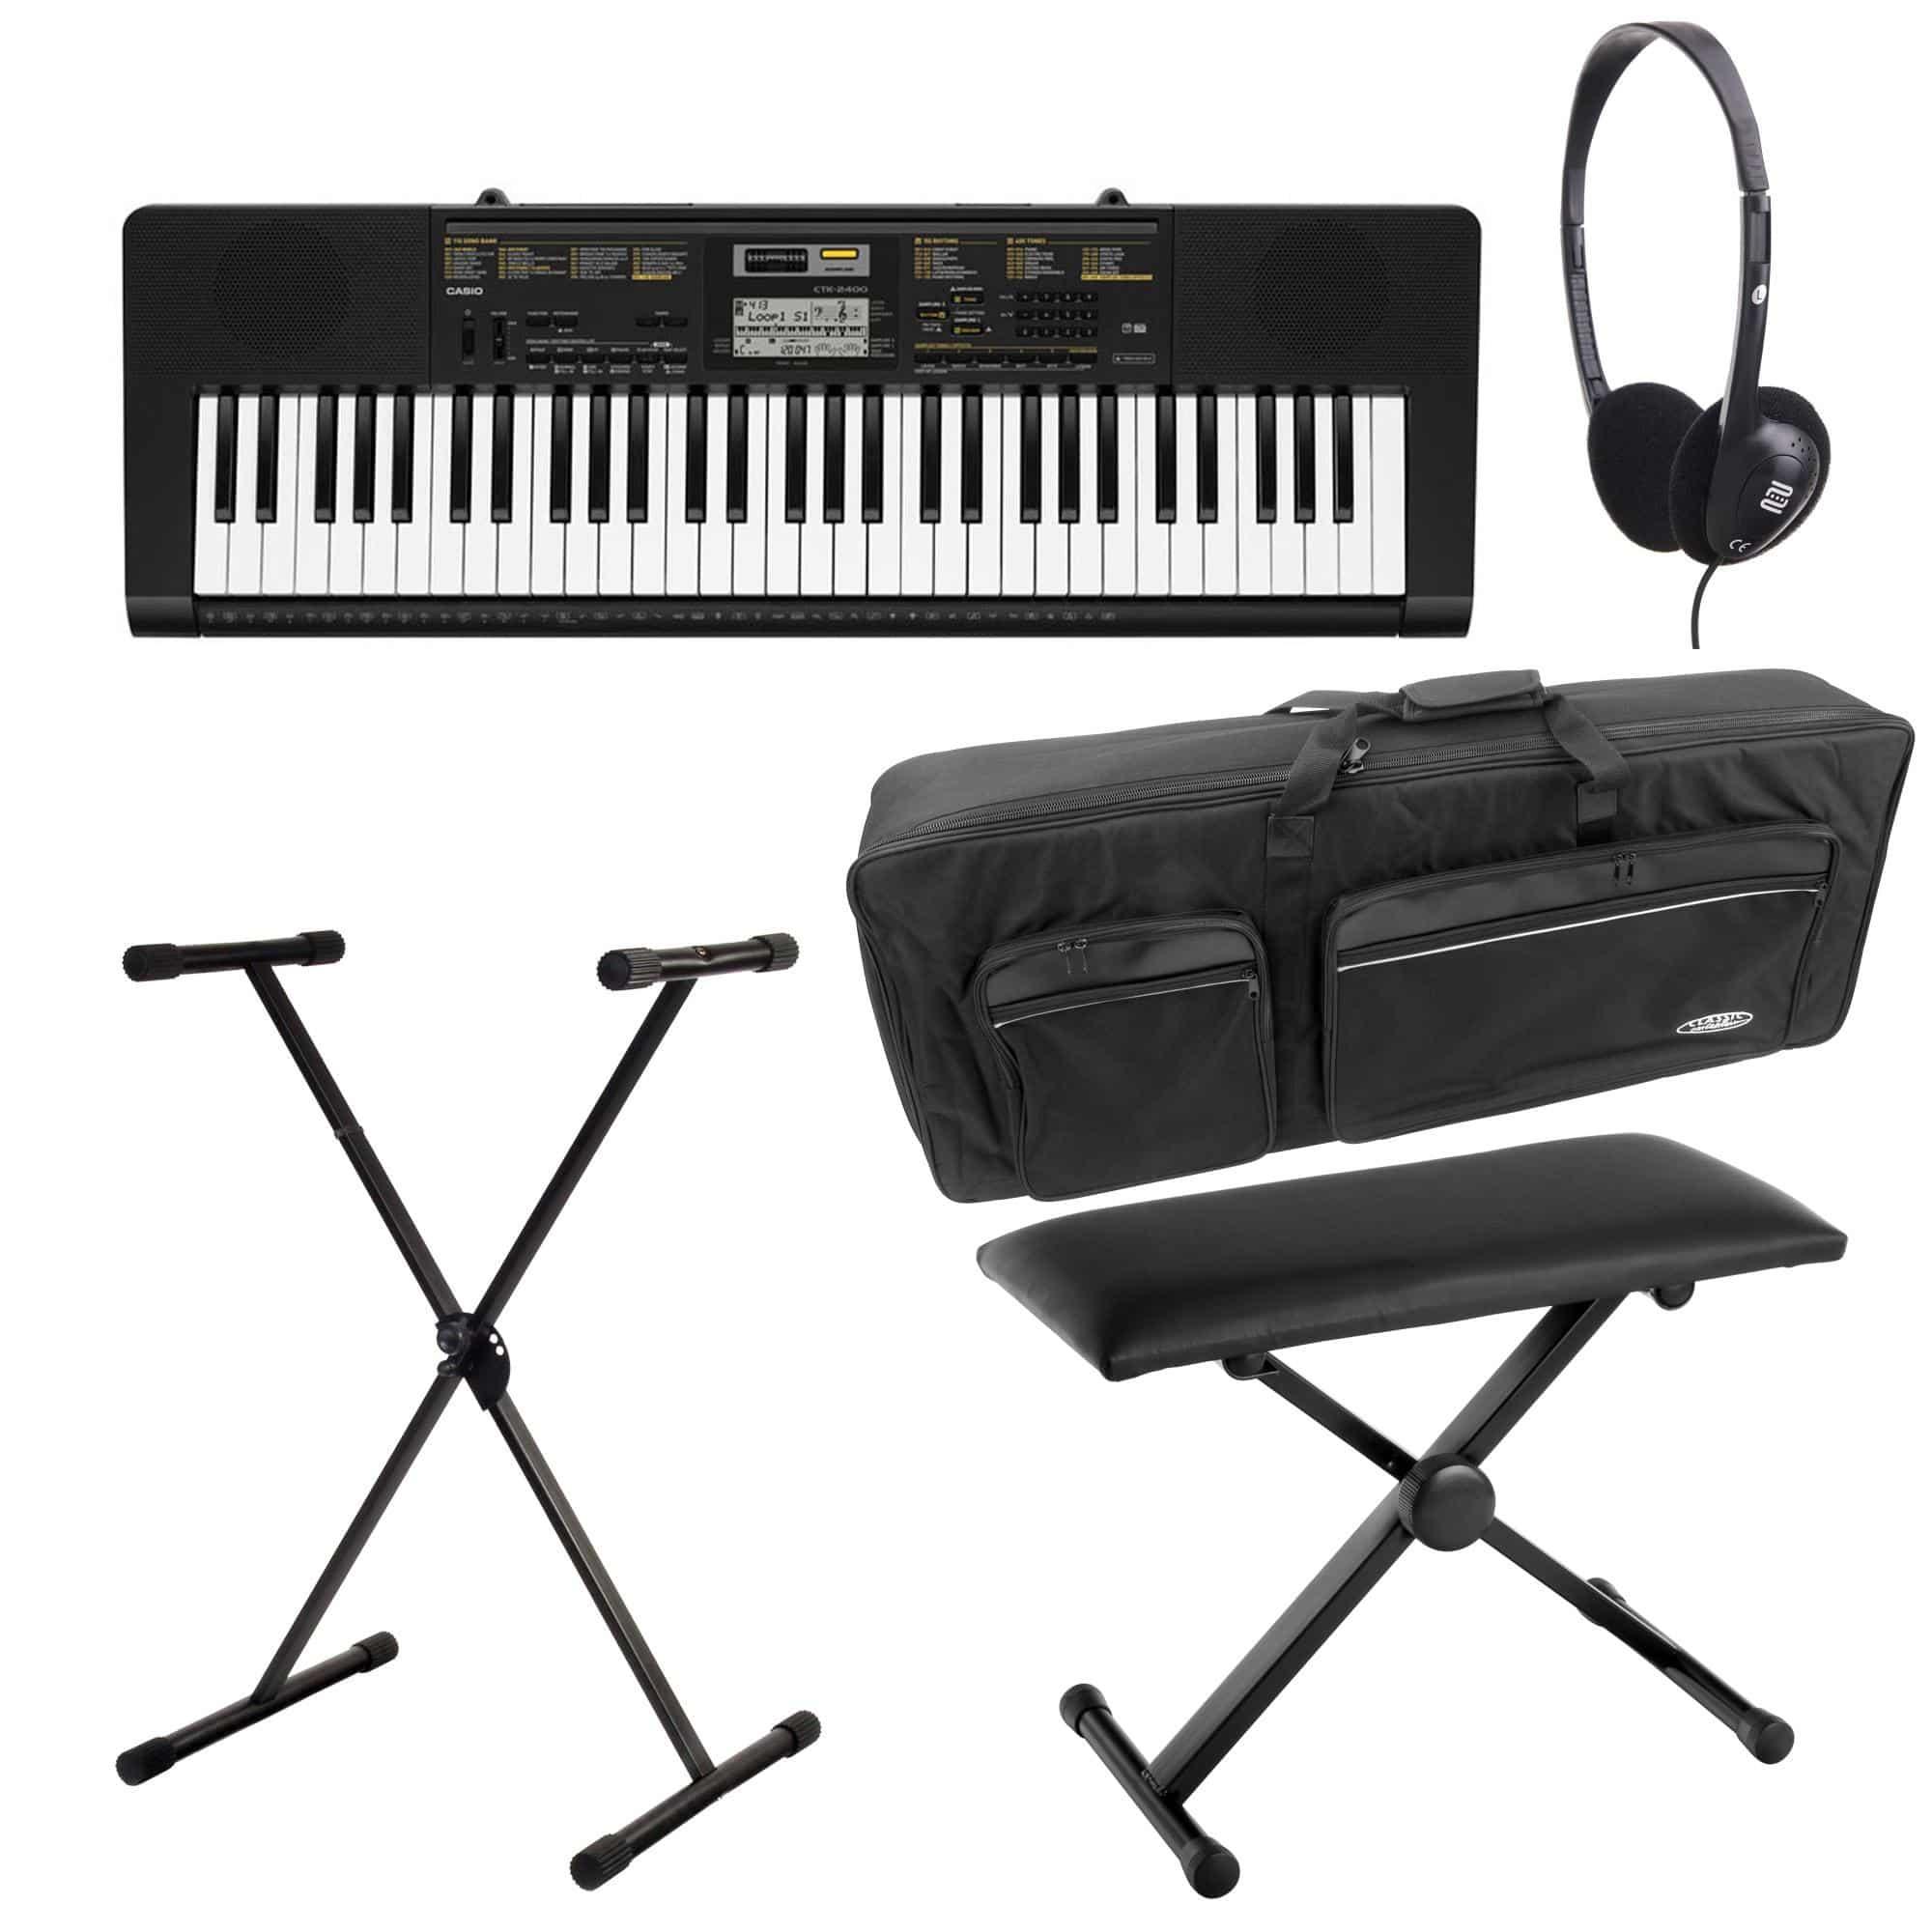 casio ctk 2400 keyboard deluxe set kirstein music shop. Black Bedroom Furniture Sets. Home Design Ideas